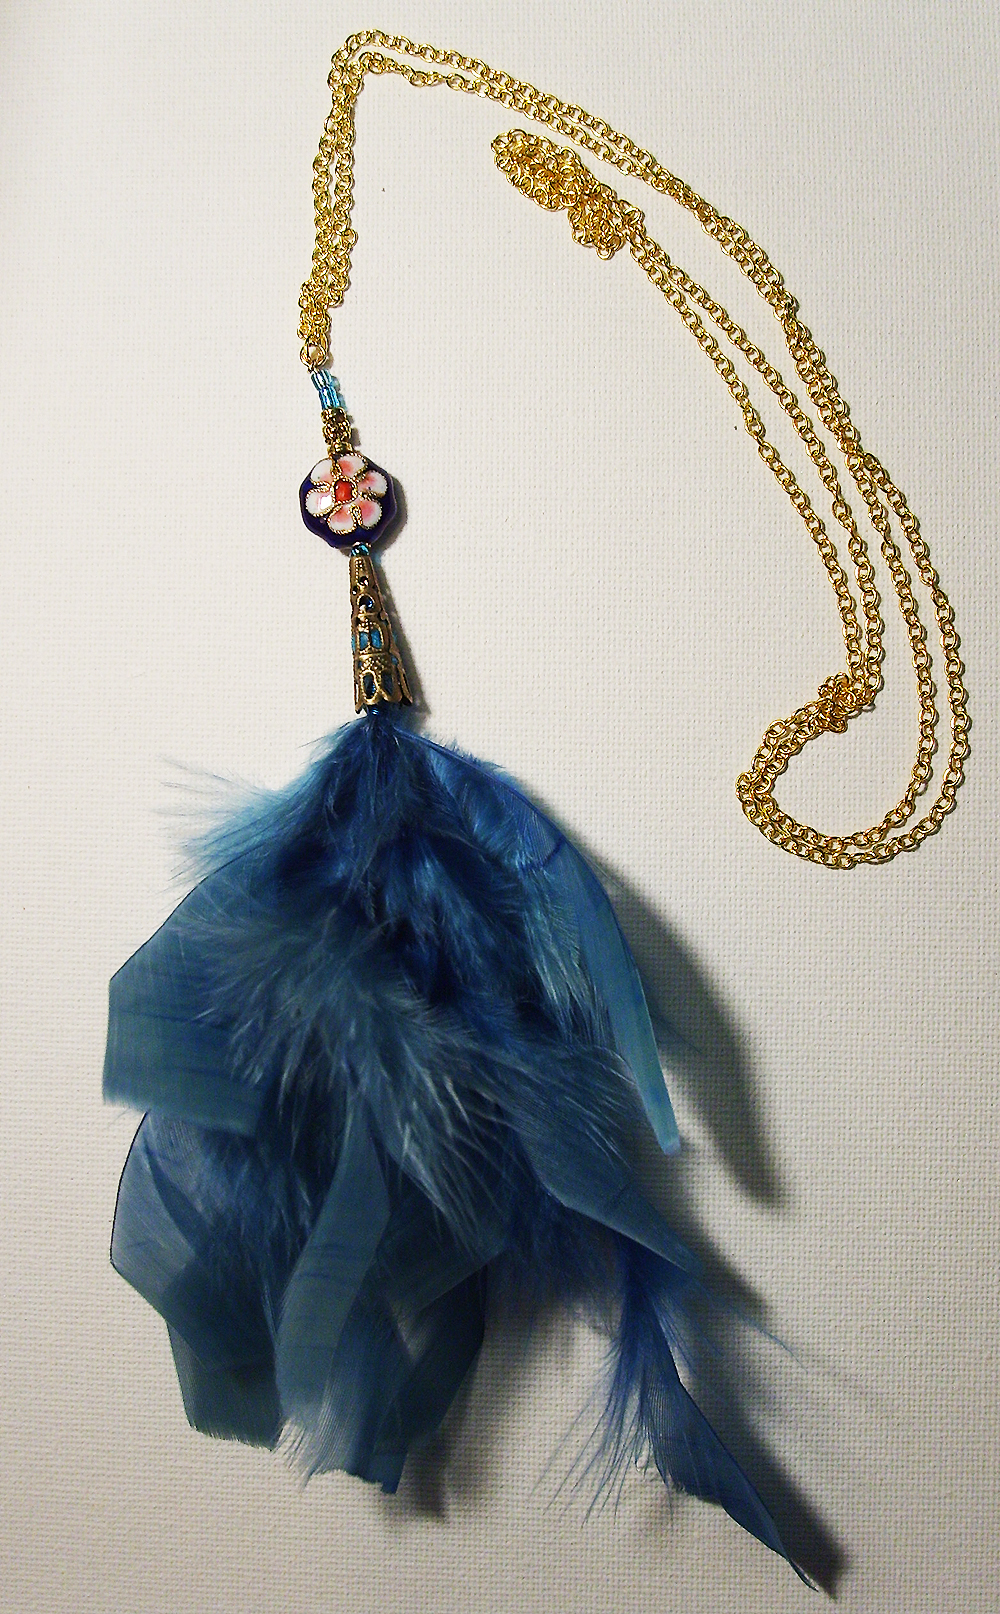 DIY Bracelet Tutorial | Today's Creative Life  |Diy Custom Jewelry Pendant